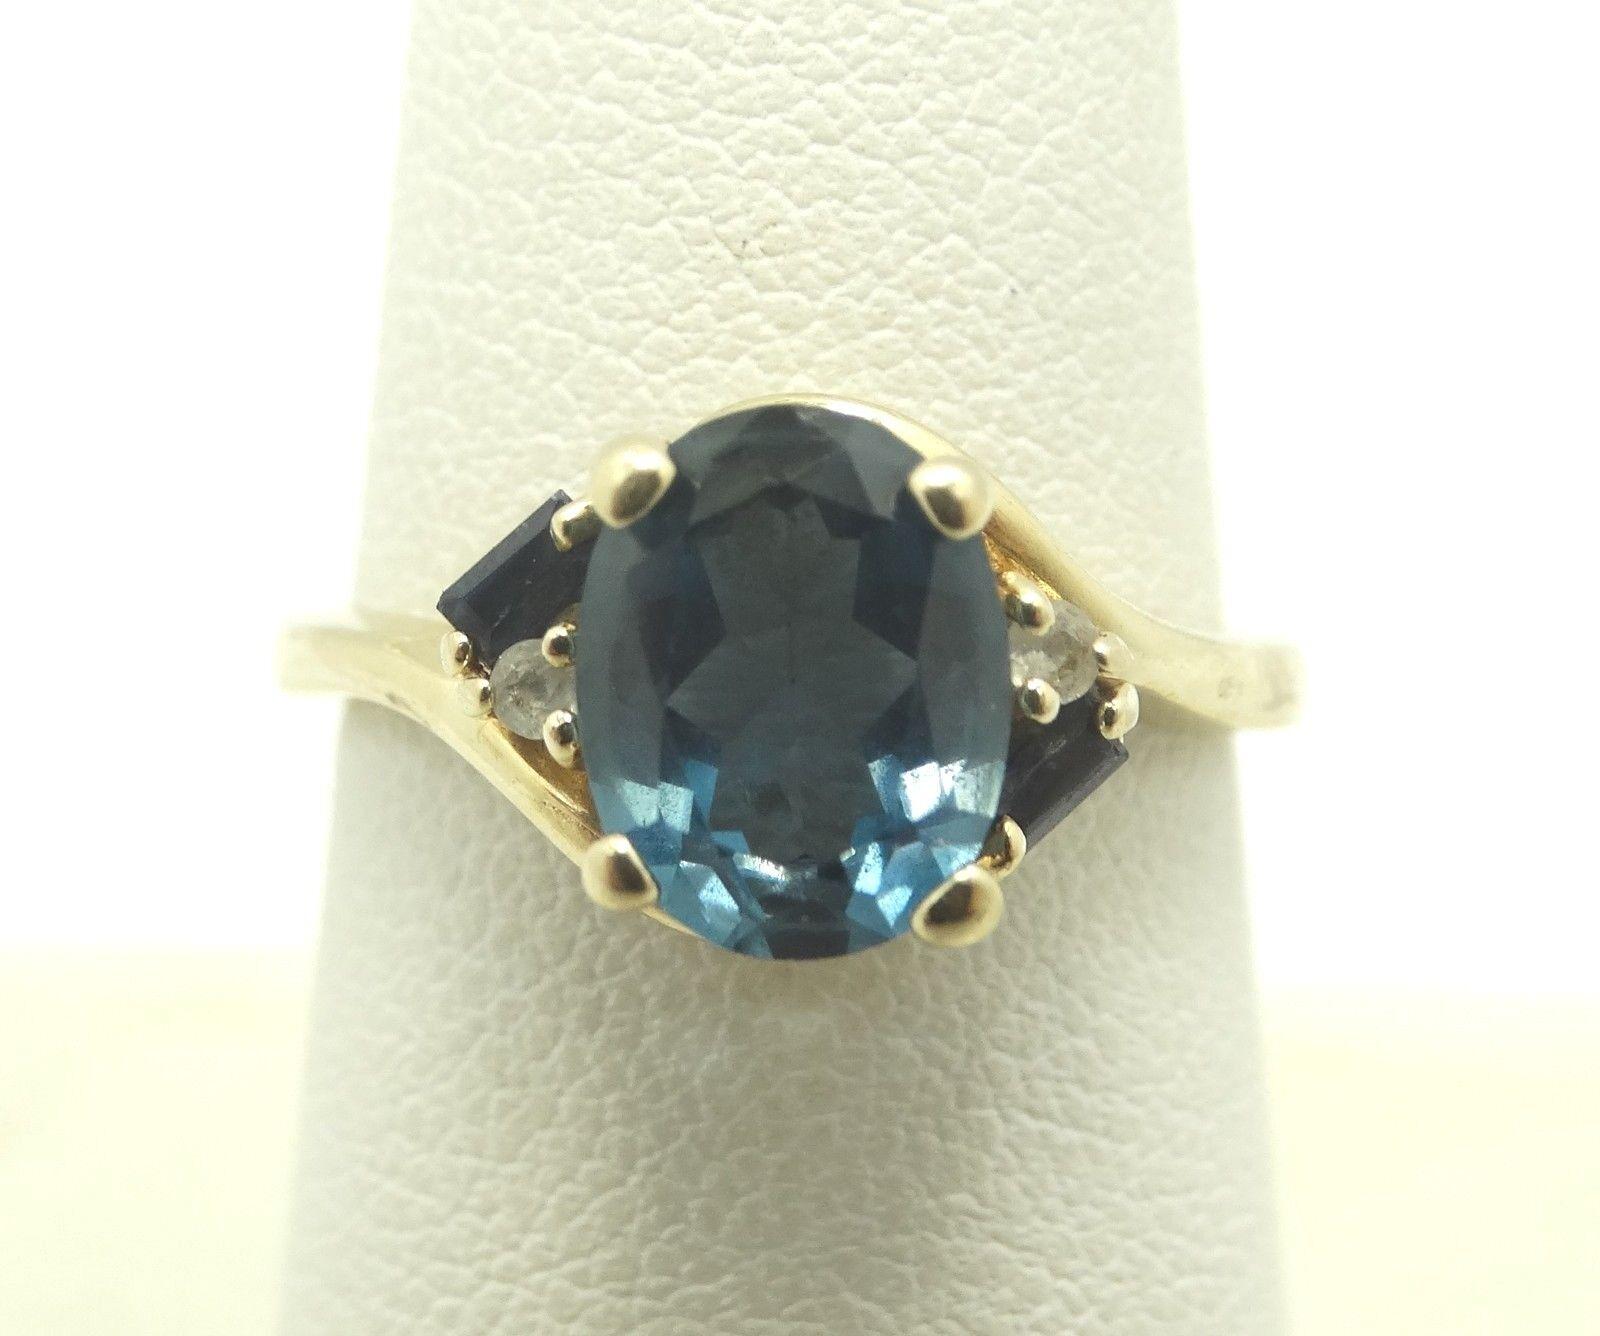 Stunning 14K Y gold Diamond 9mm Oval London blueee Topaz Ring Size 7 3.8g D5354